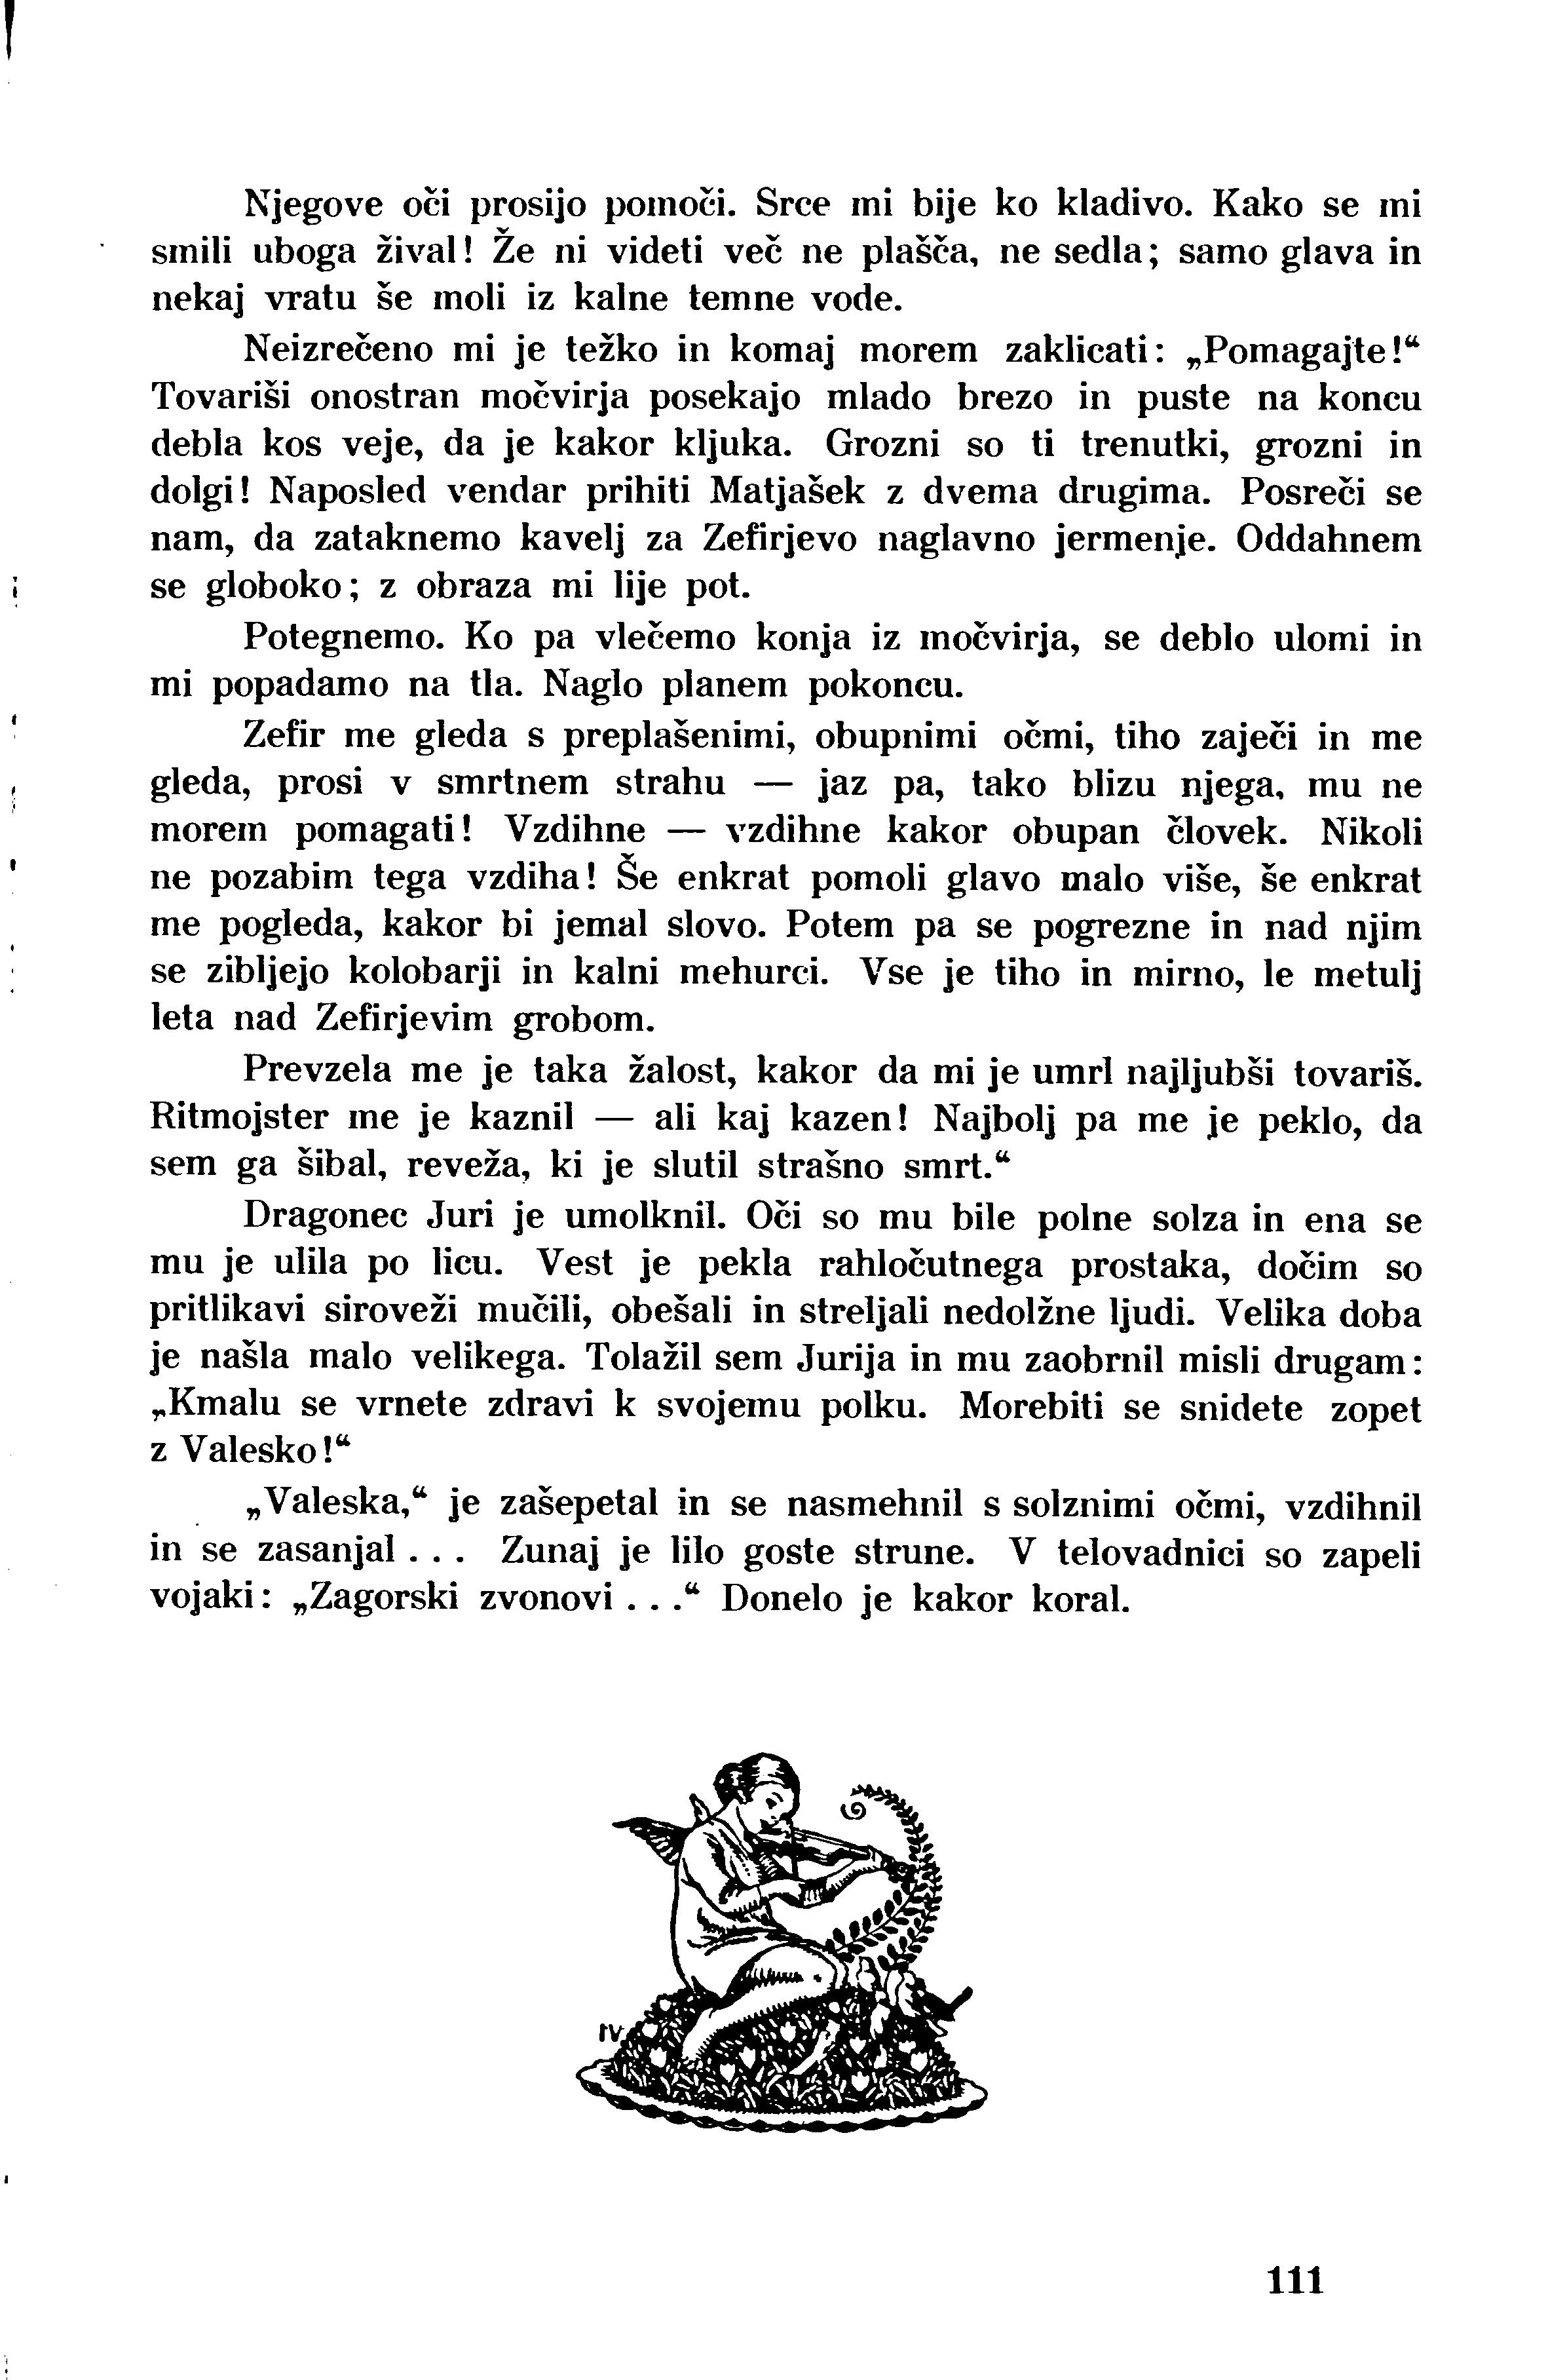 Kladivo Konj In Voda Kladivo Konj In Voda 1979-1984